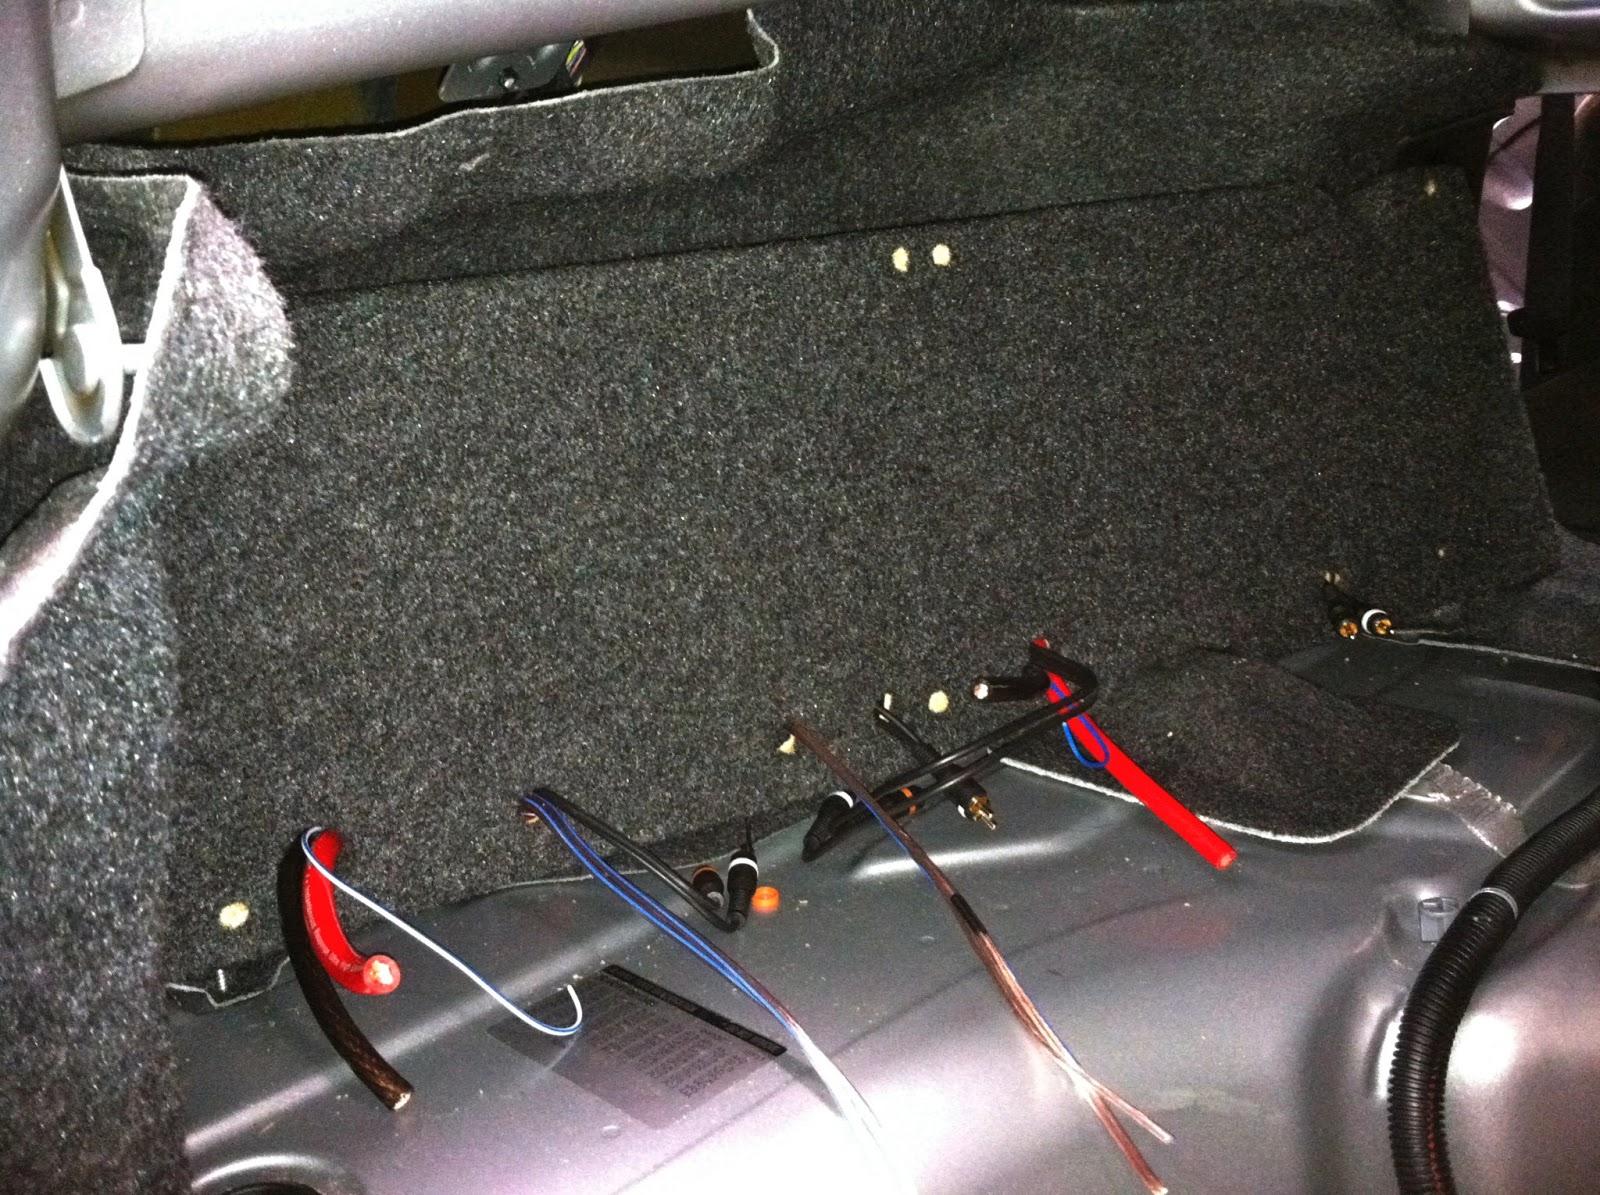 2012 chevy camaro aftermarket amp sub install [ 1600 x 1195 Pixel ]